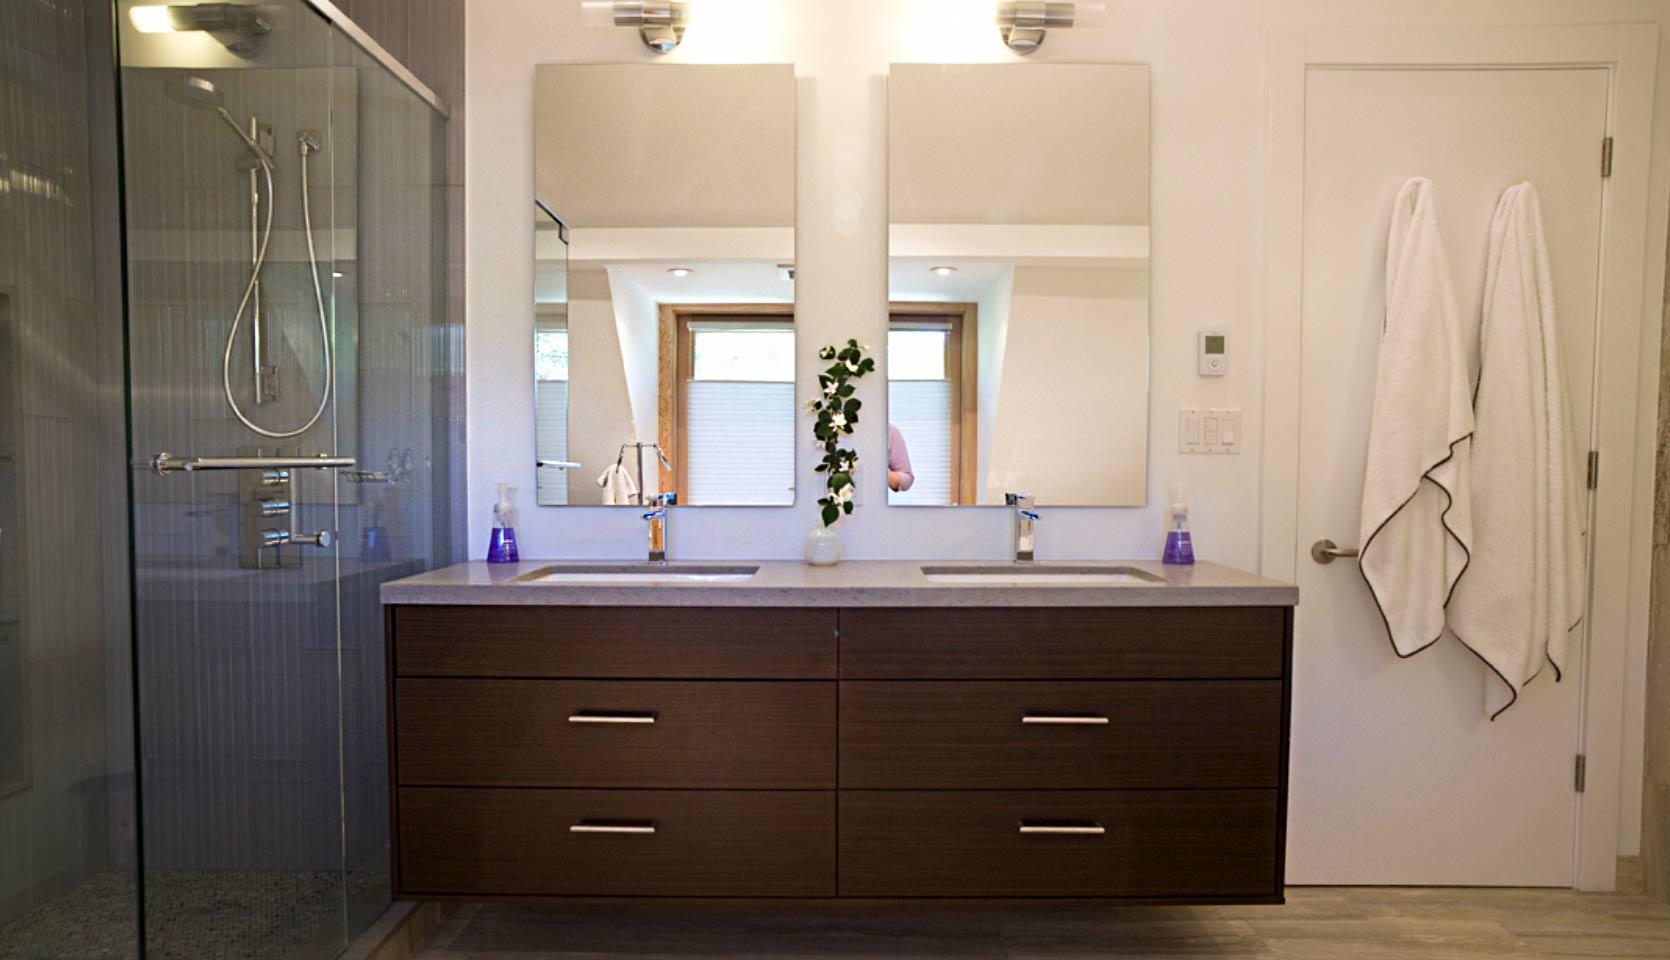 severnwoods-roxborough-house-bathroom-front